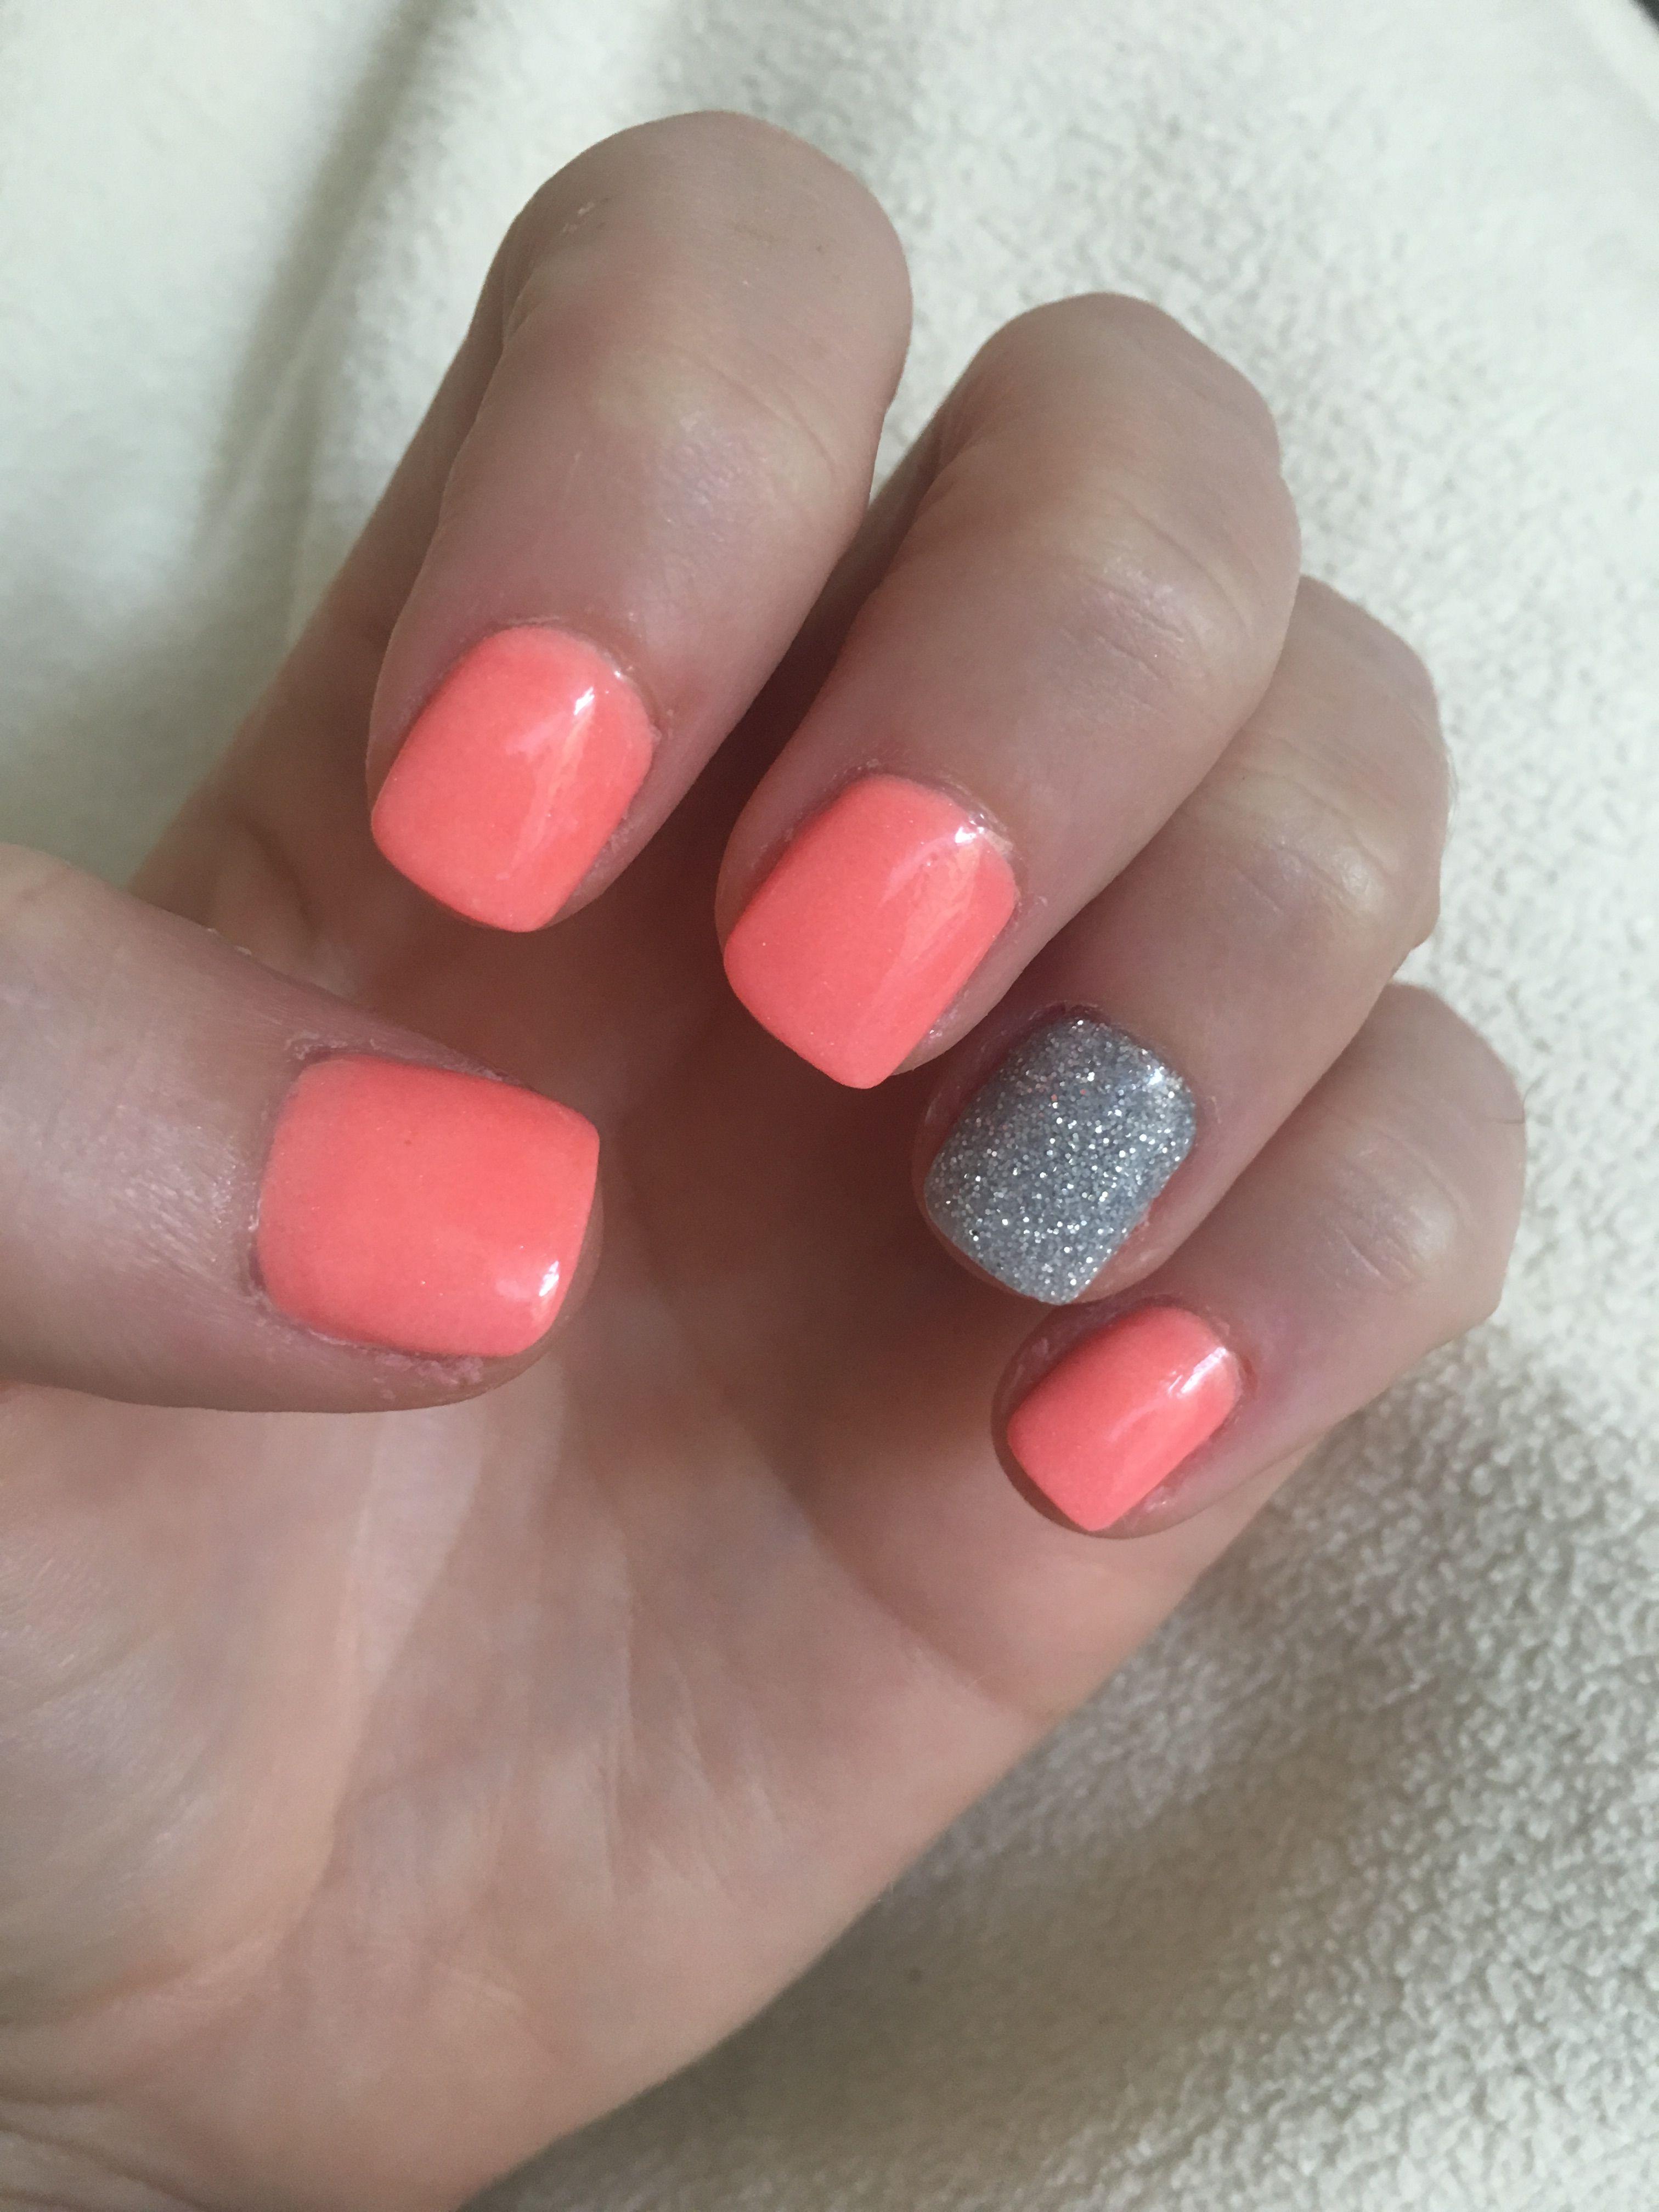 Neon Sparkle Silver And Coral Nexgen Nail Dip Acrylic Powder Perfect For Summer Nexgen Nails Nexgen Nails Colors Nail Designs Summer Acrylic